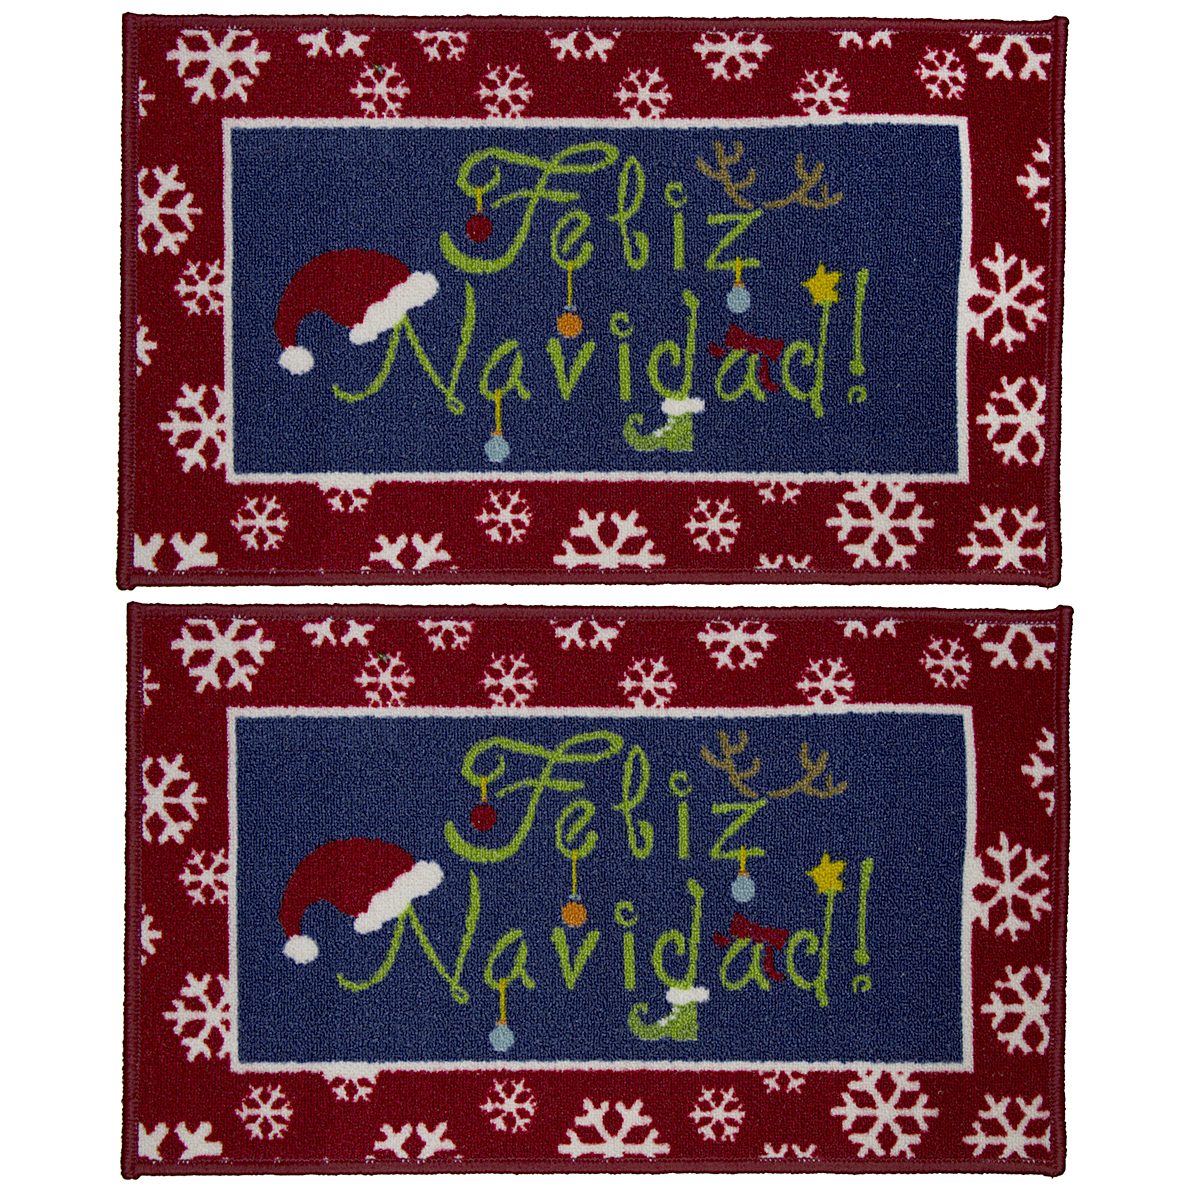 "2pk Holiday 17"" x 29"" Doormats Christmas Rug Nylon Nonslip"